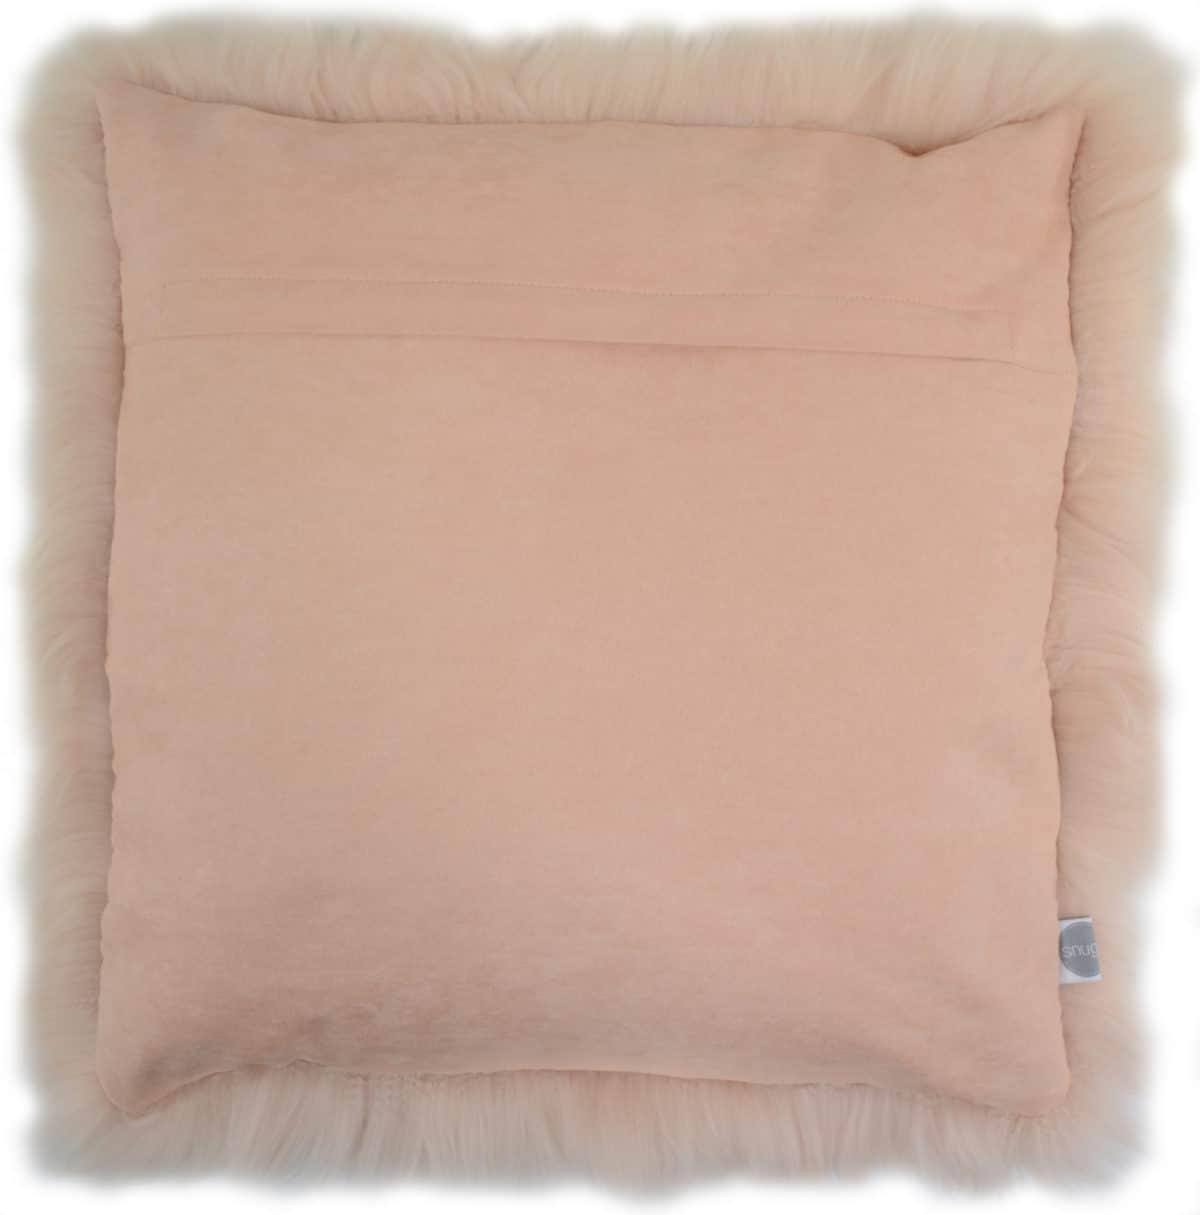 Australian Sheepskin Cushion 40cm x 40xm - Light Pink